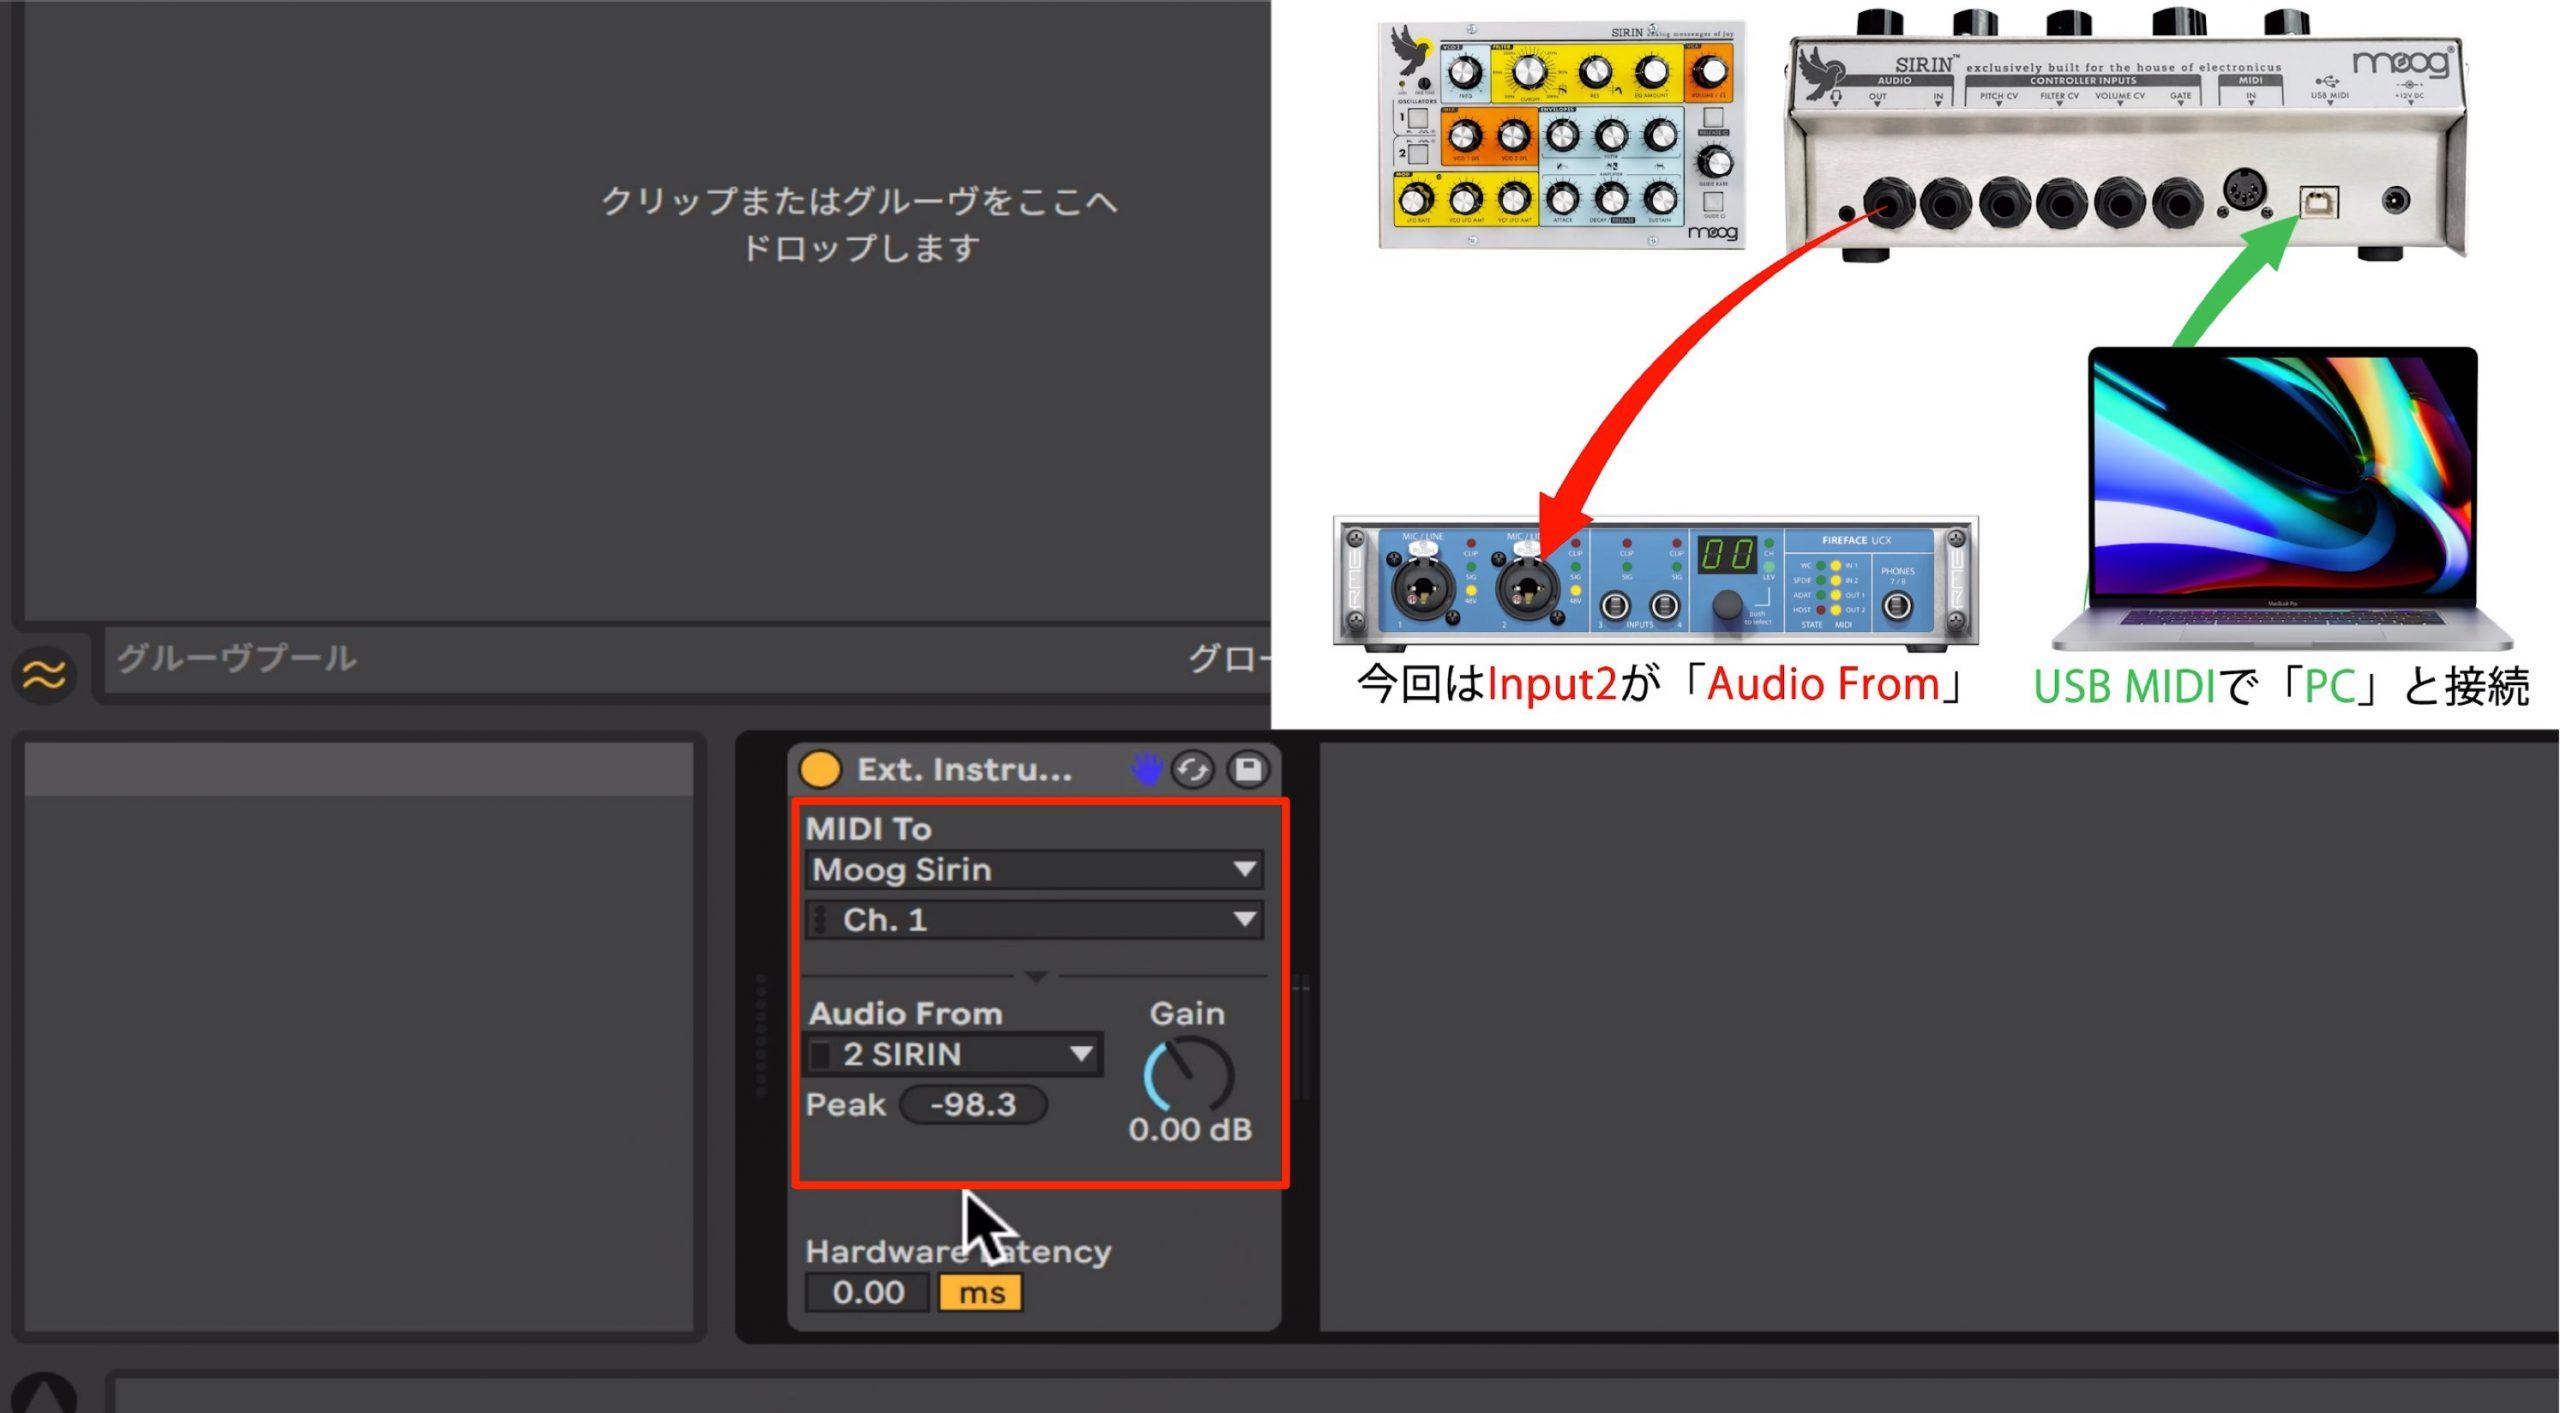 External Instrumen MIDI Audio